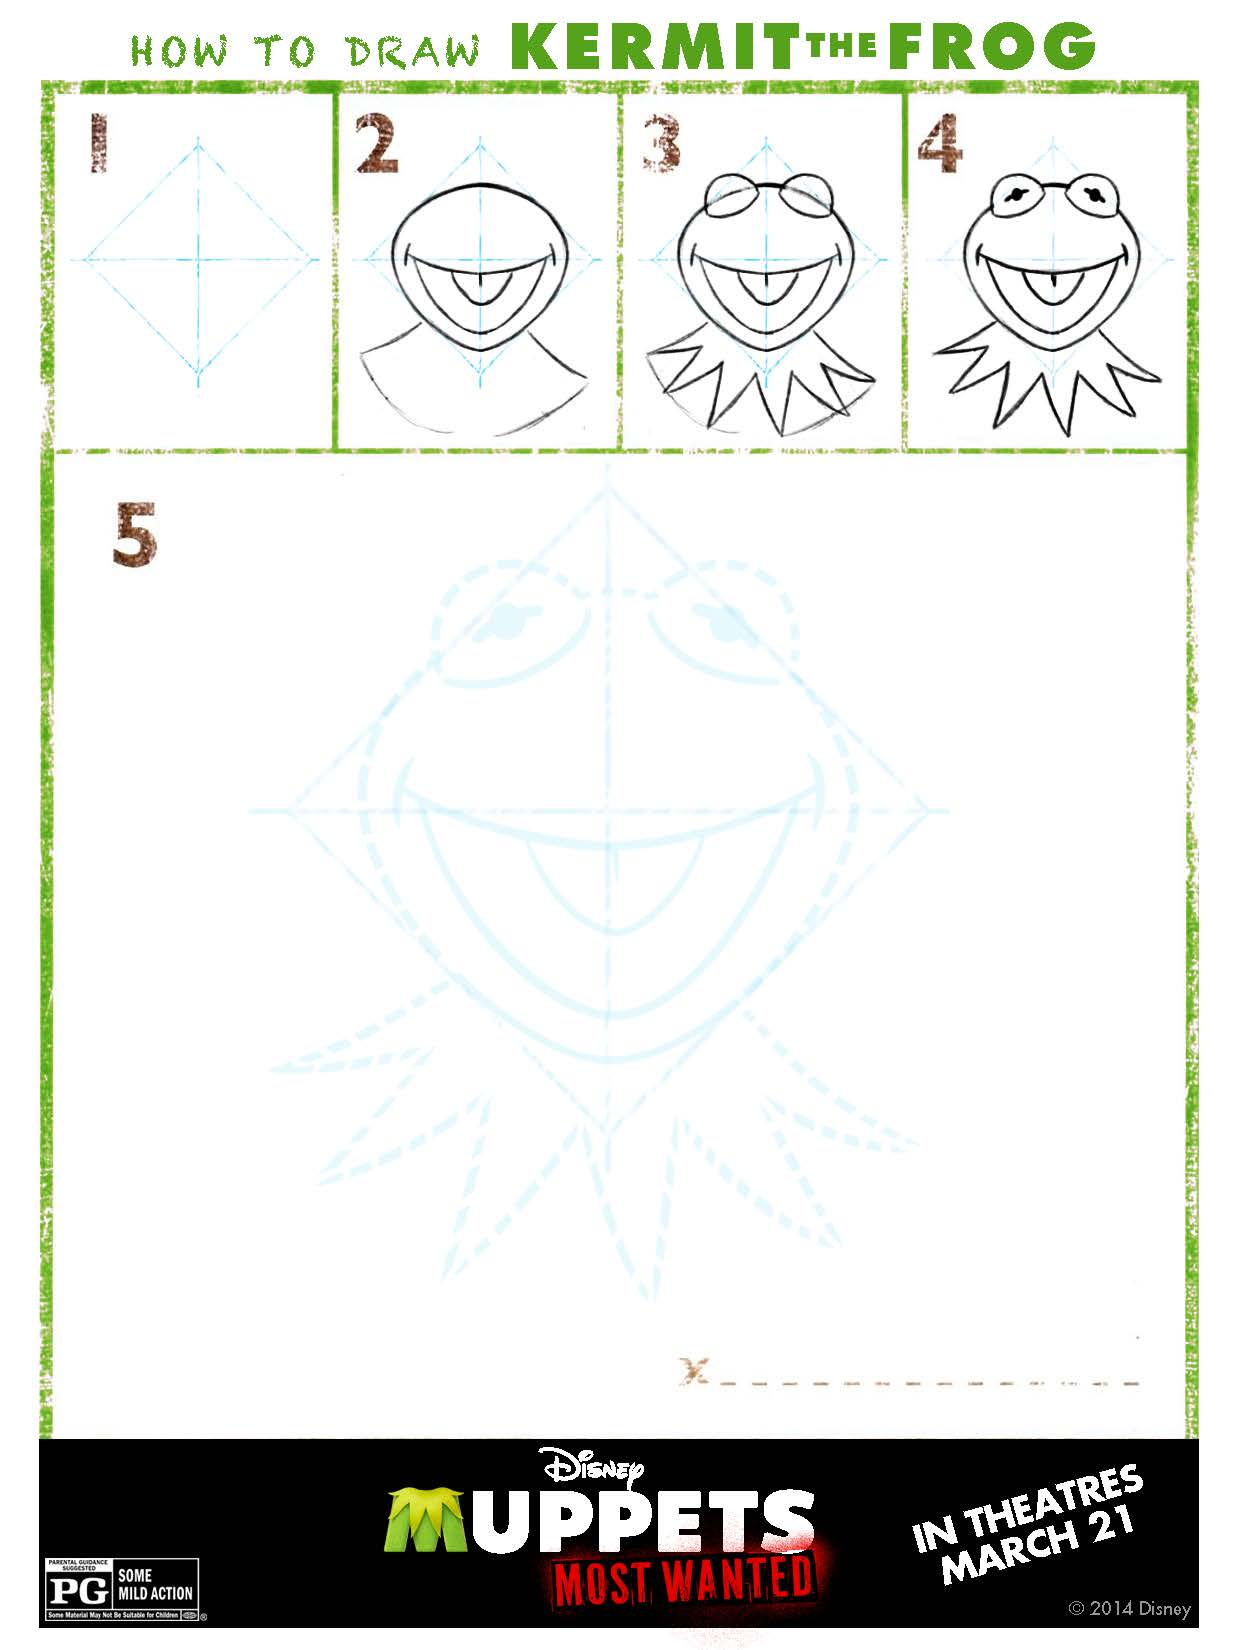 muppetsmostwanted530bfc619cff4